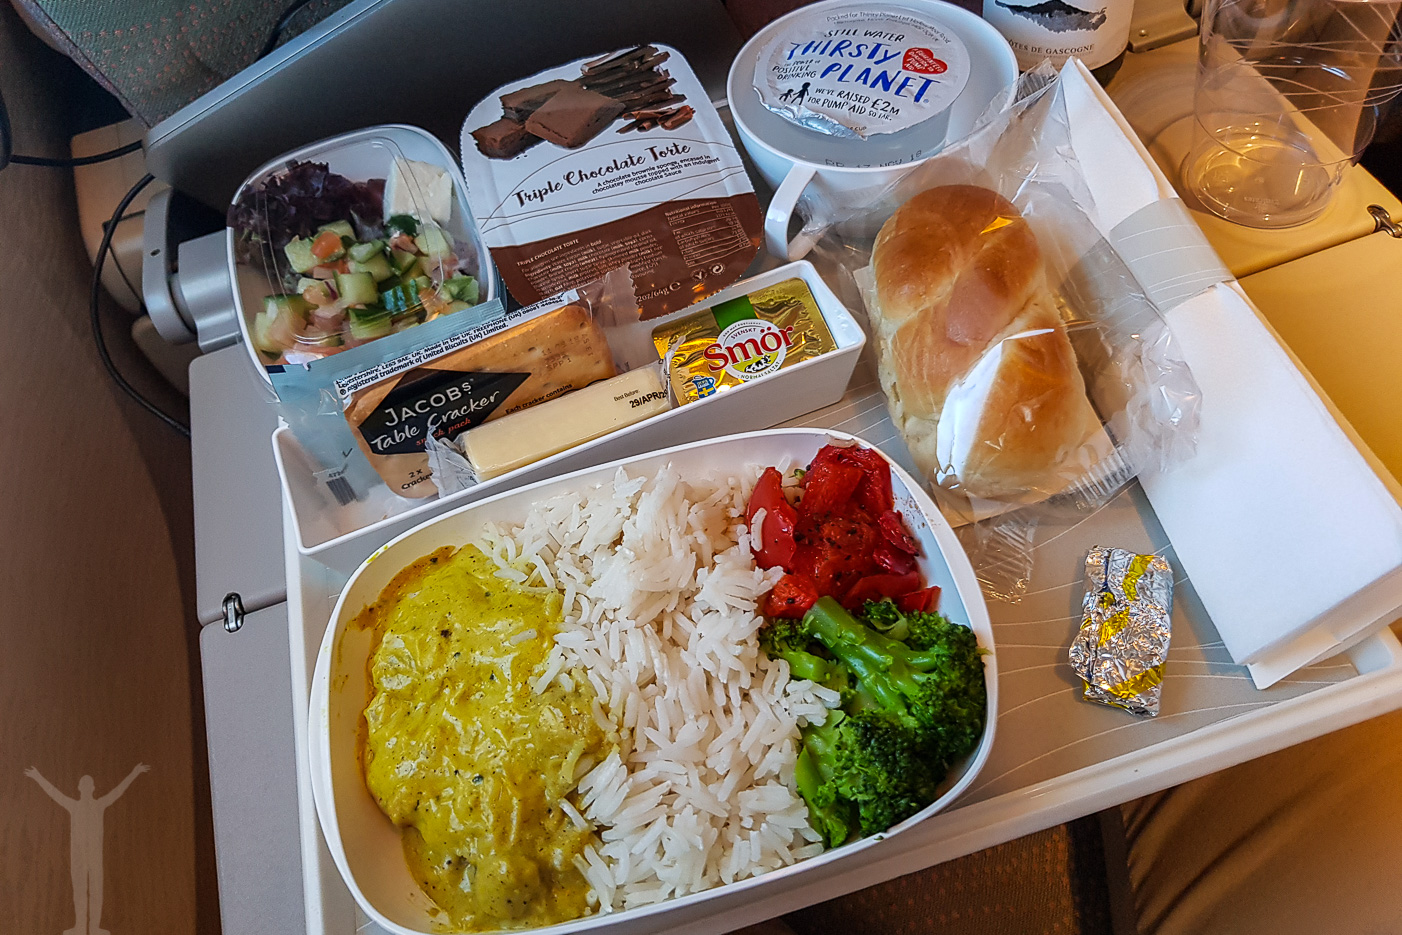 Middag i ekonomiklass hos Emirates